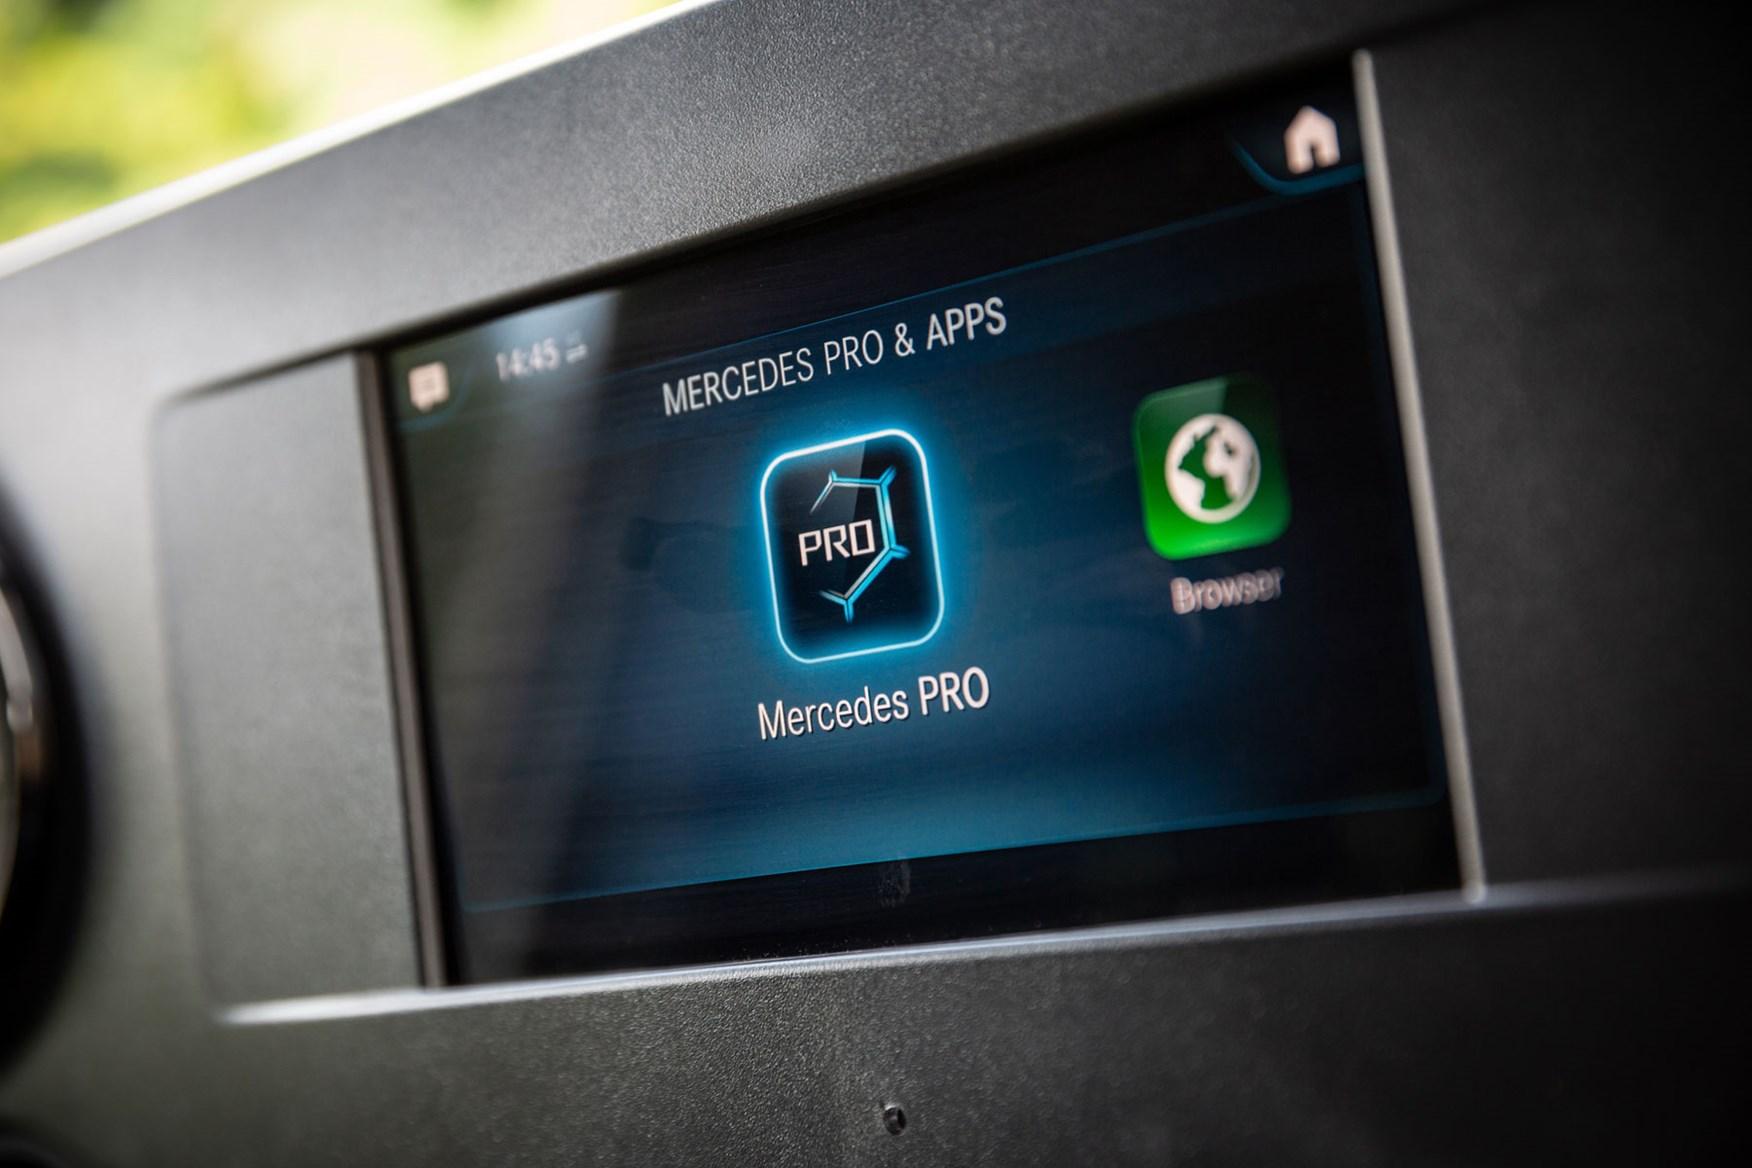 Mercedes Sprinter (2018-on) Mercedes-Benz Pro Connect screen